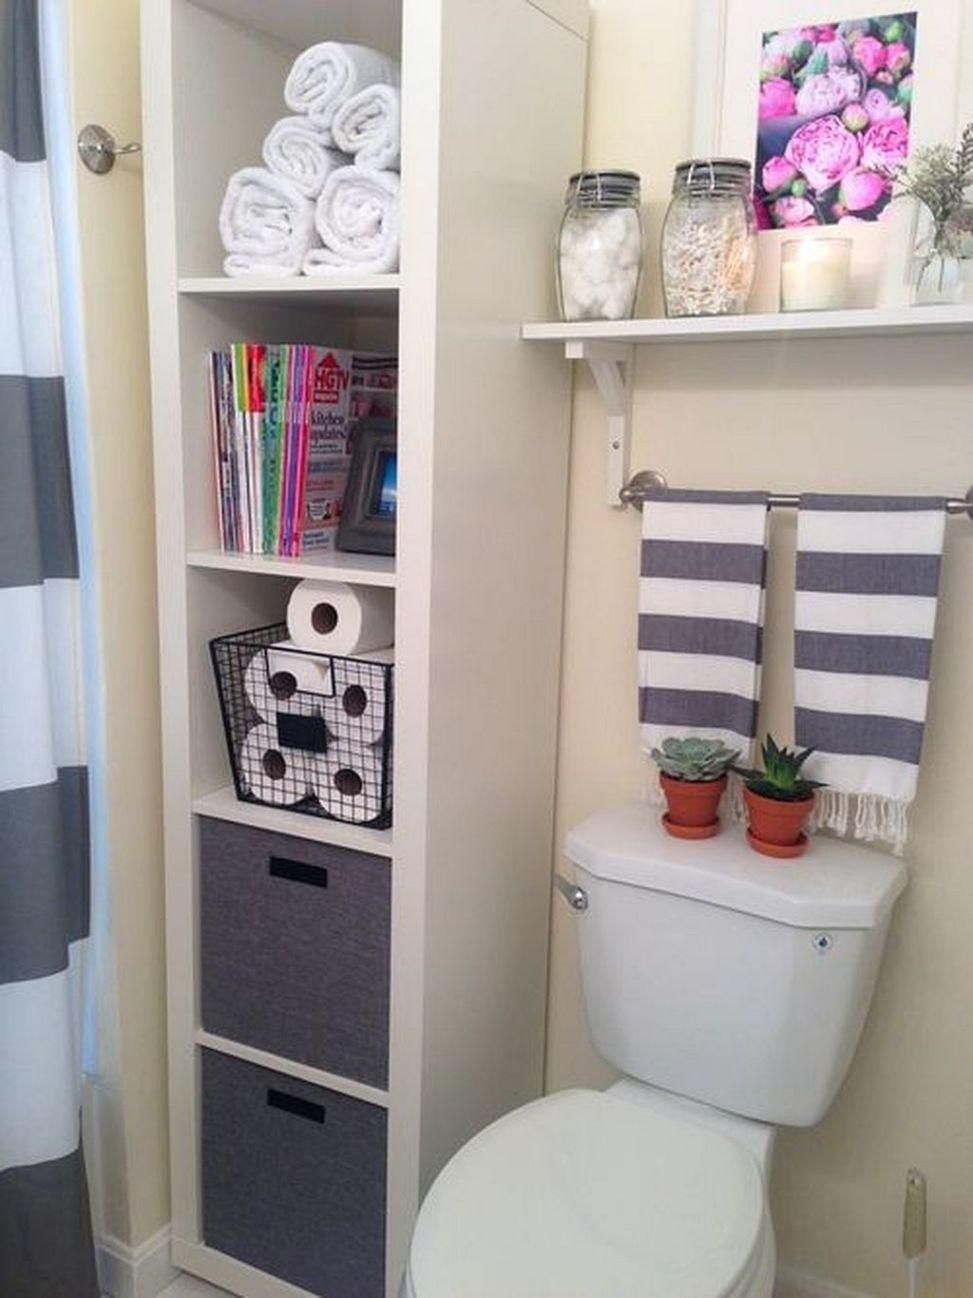 Clever bathroom storage hacks and ideas bathroomstorageideas